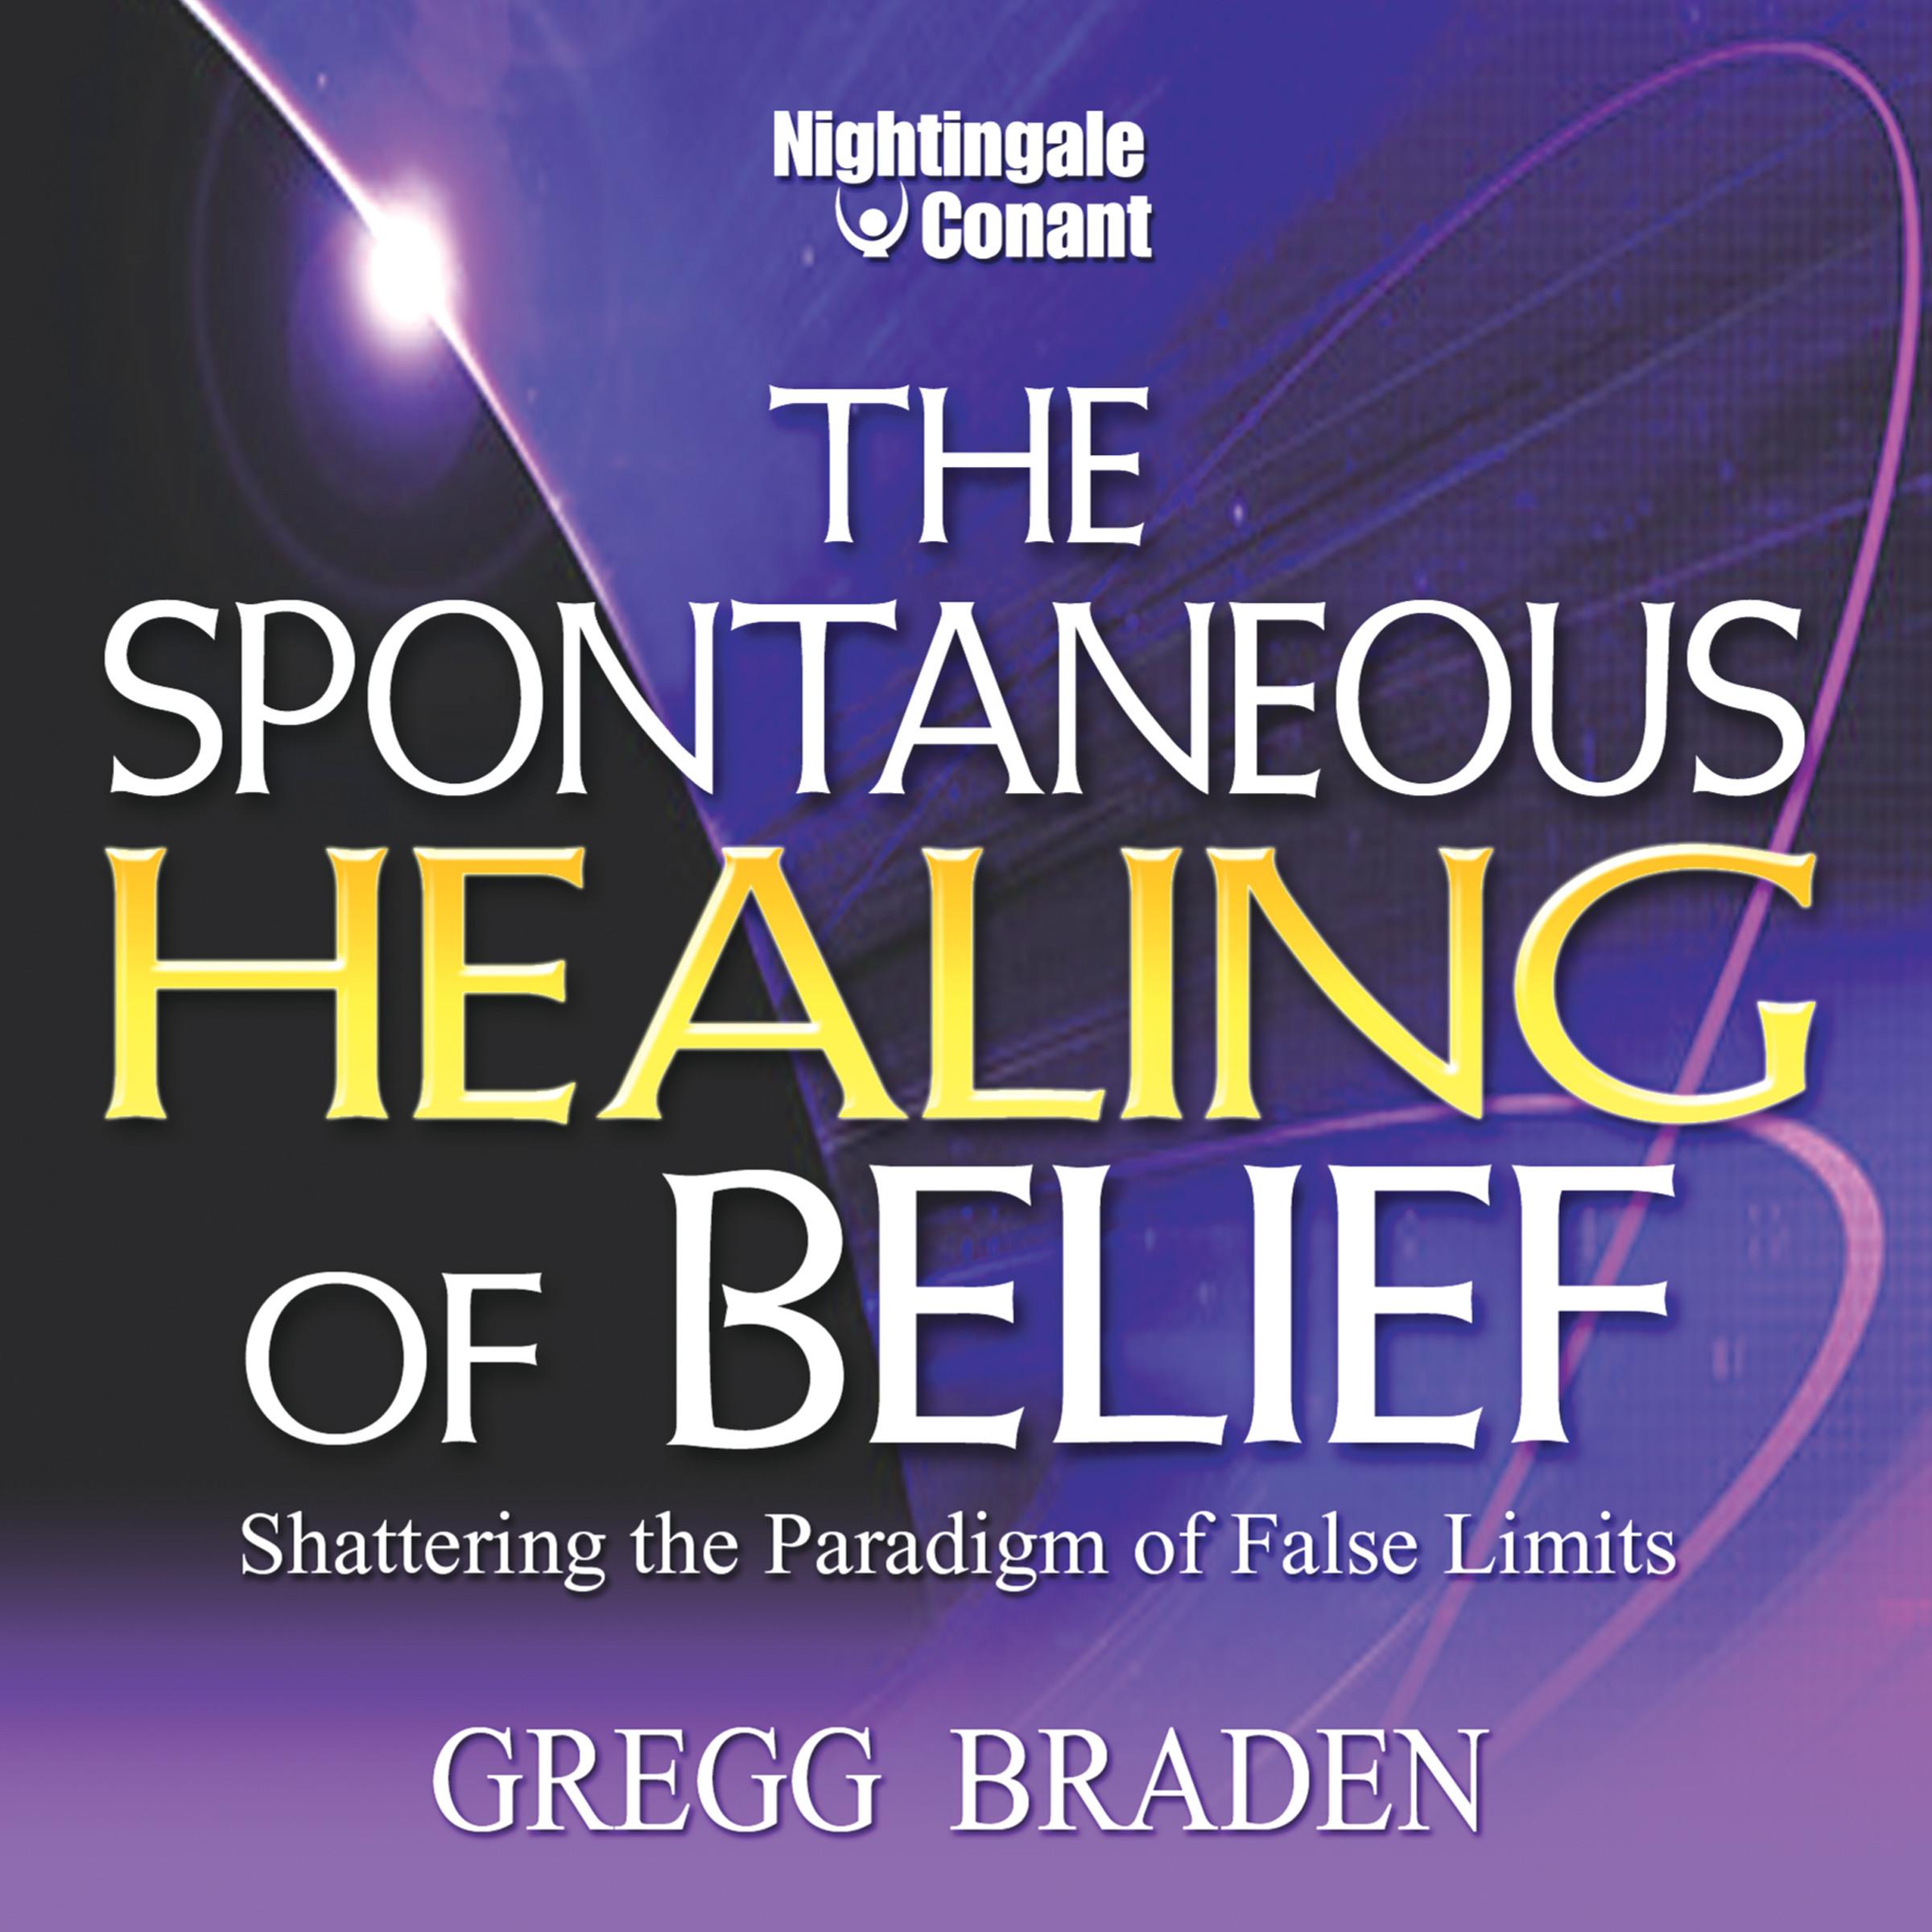 The Spontaneous Healing Of